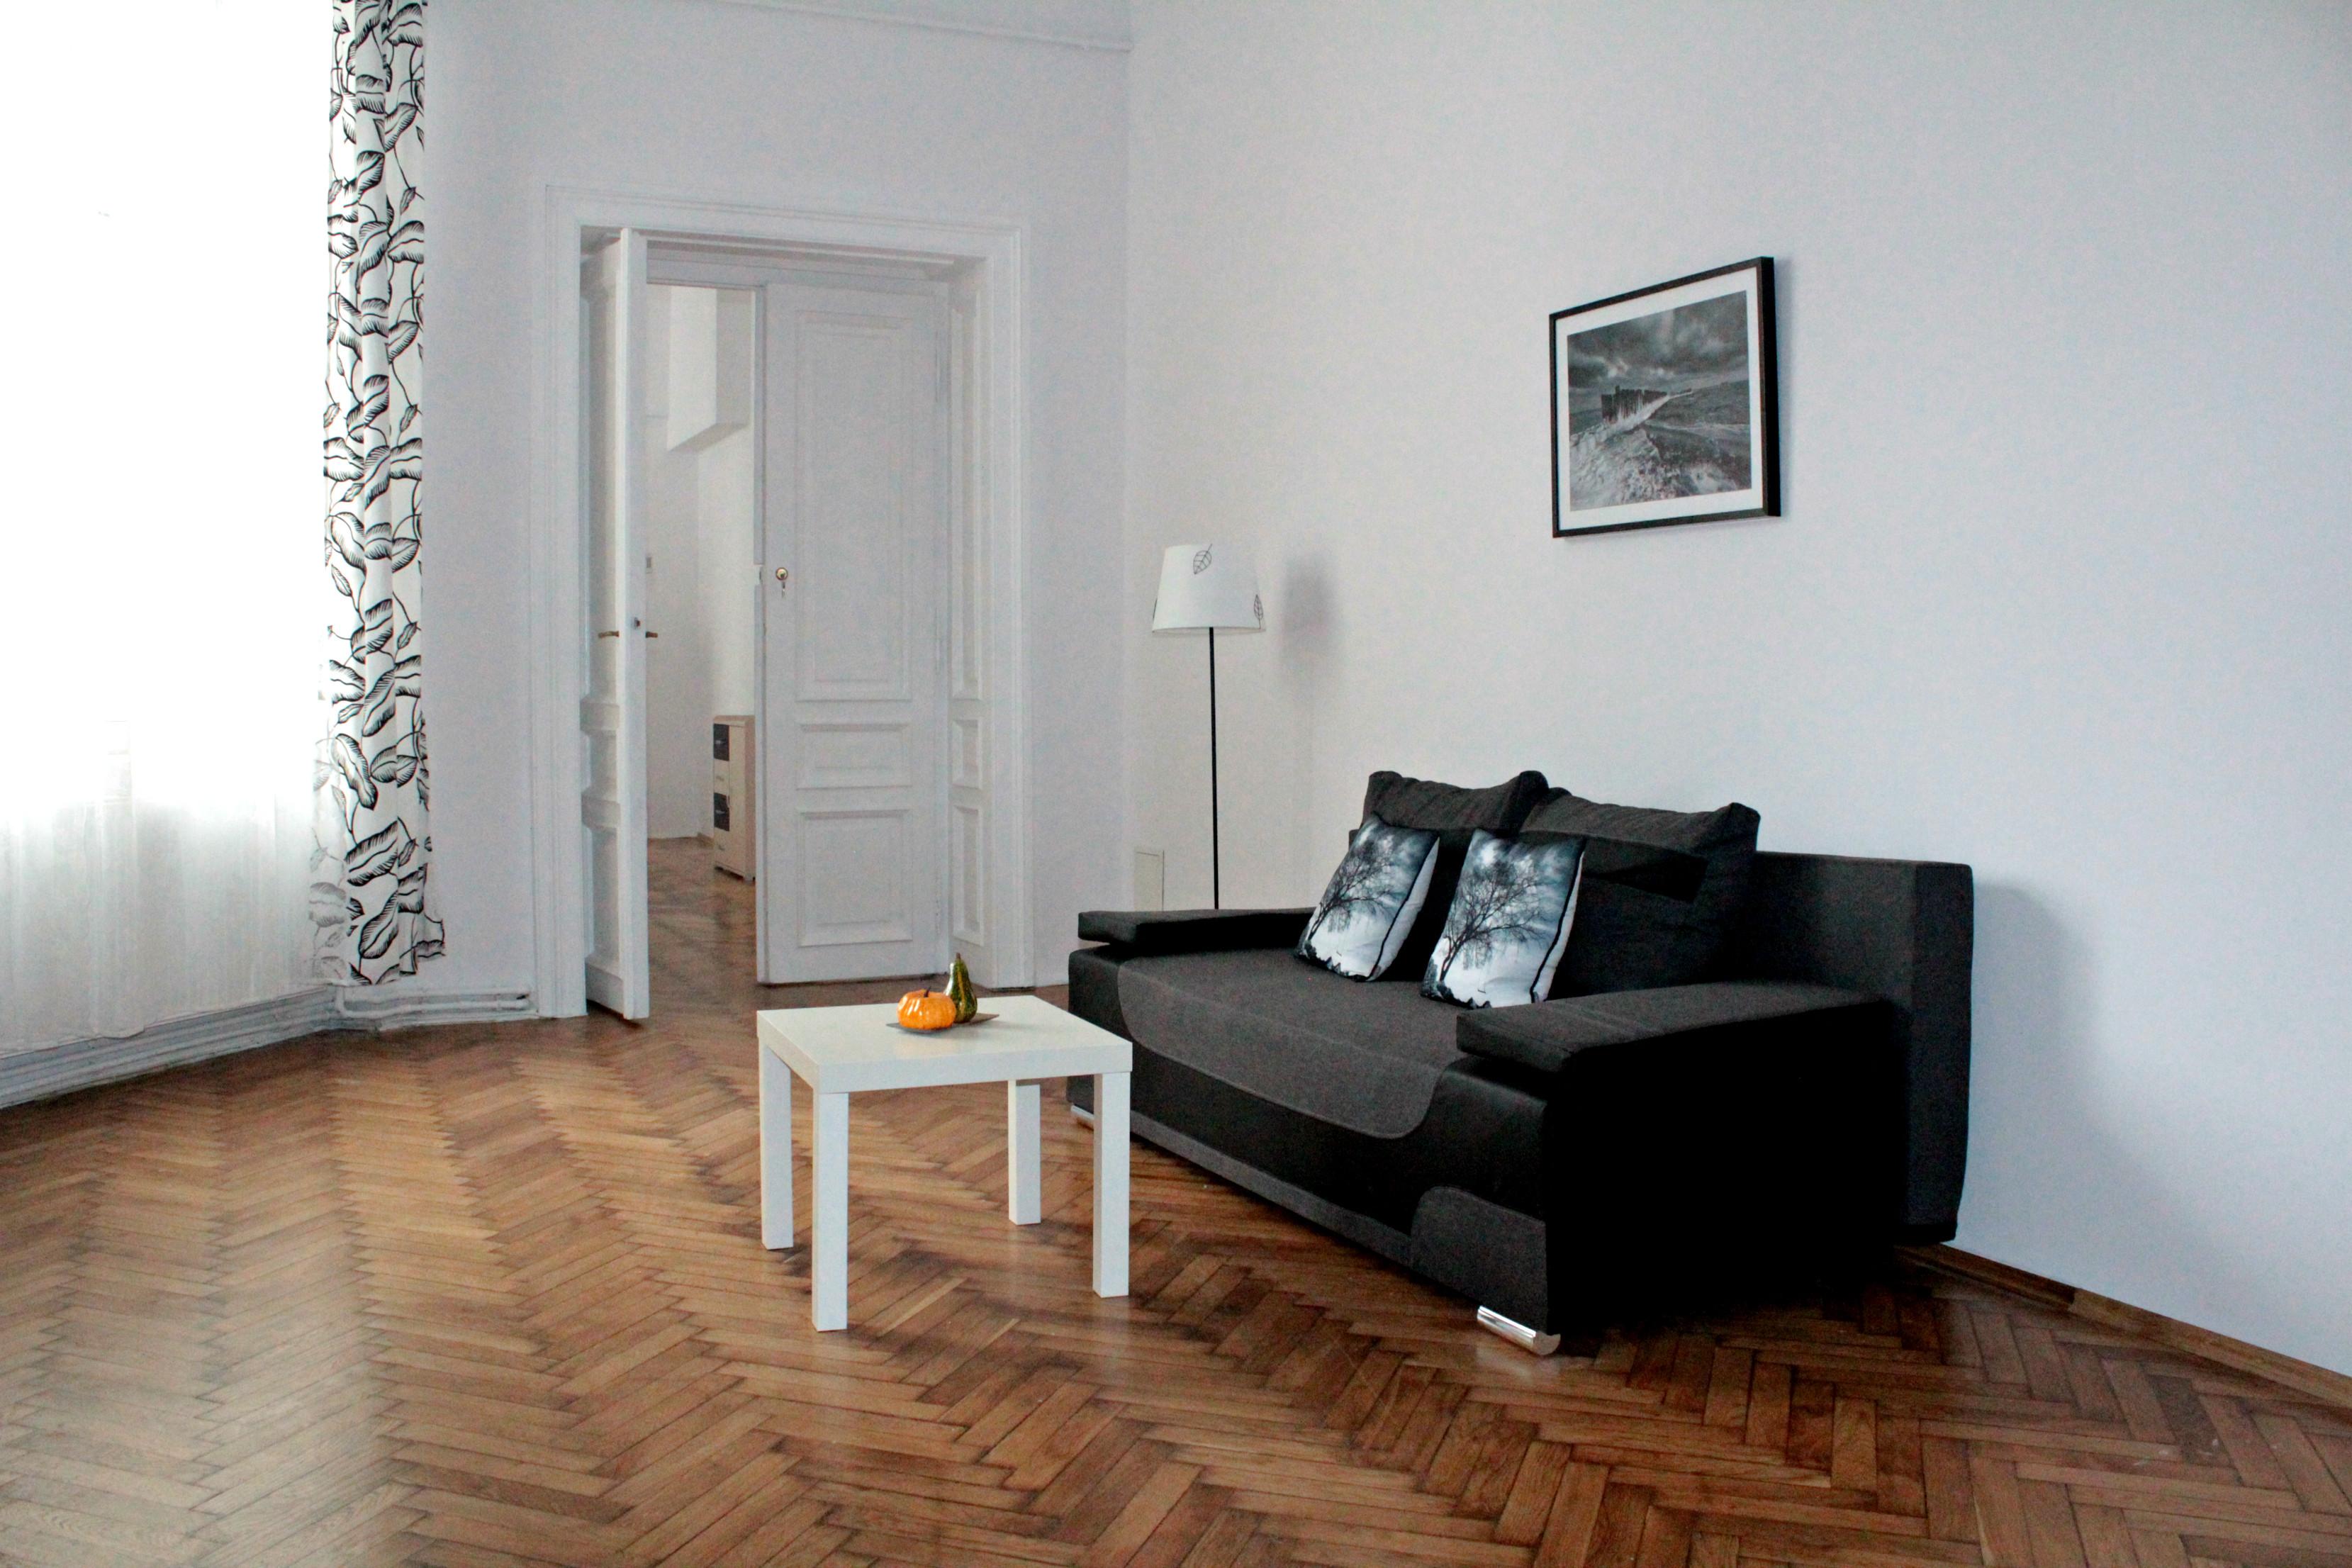 hardwood flooring niagara falls of galicja 7 apartment in krakow galicja 7 krakow for galicja 7